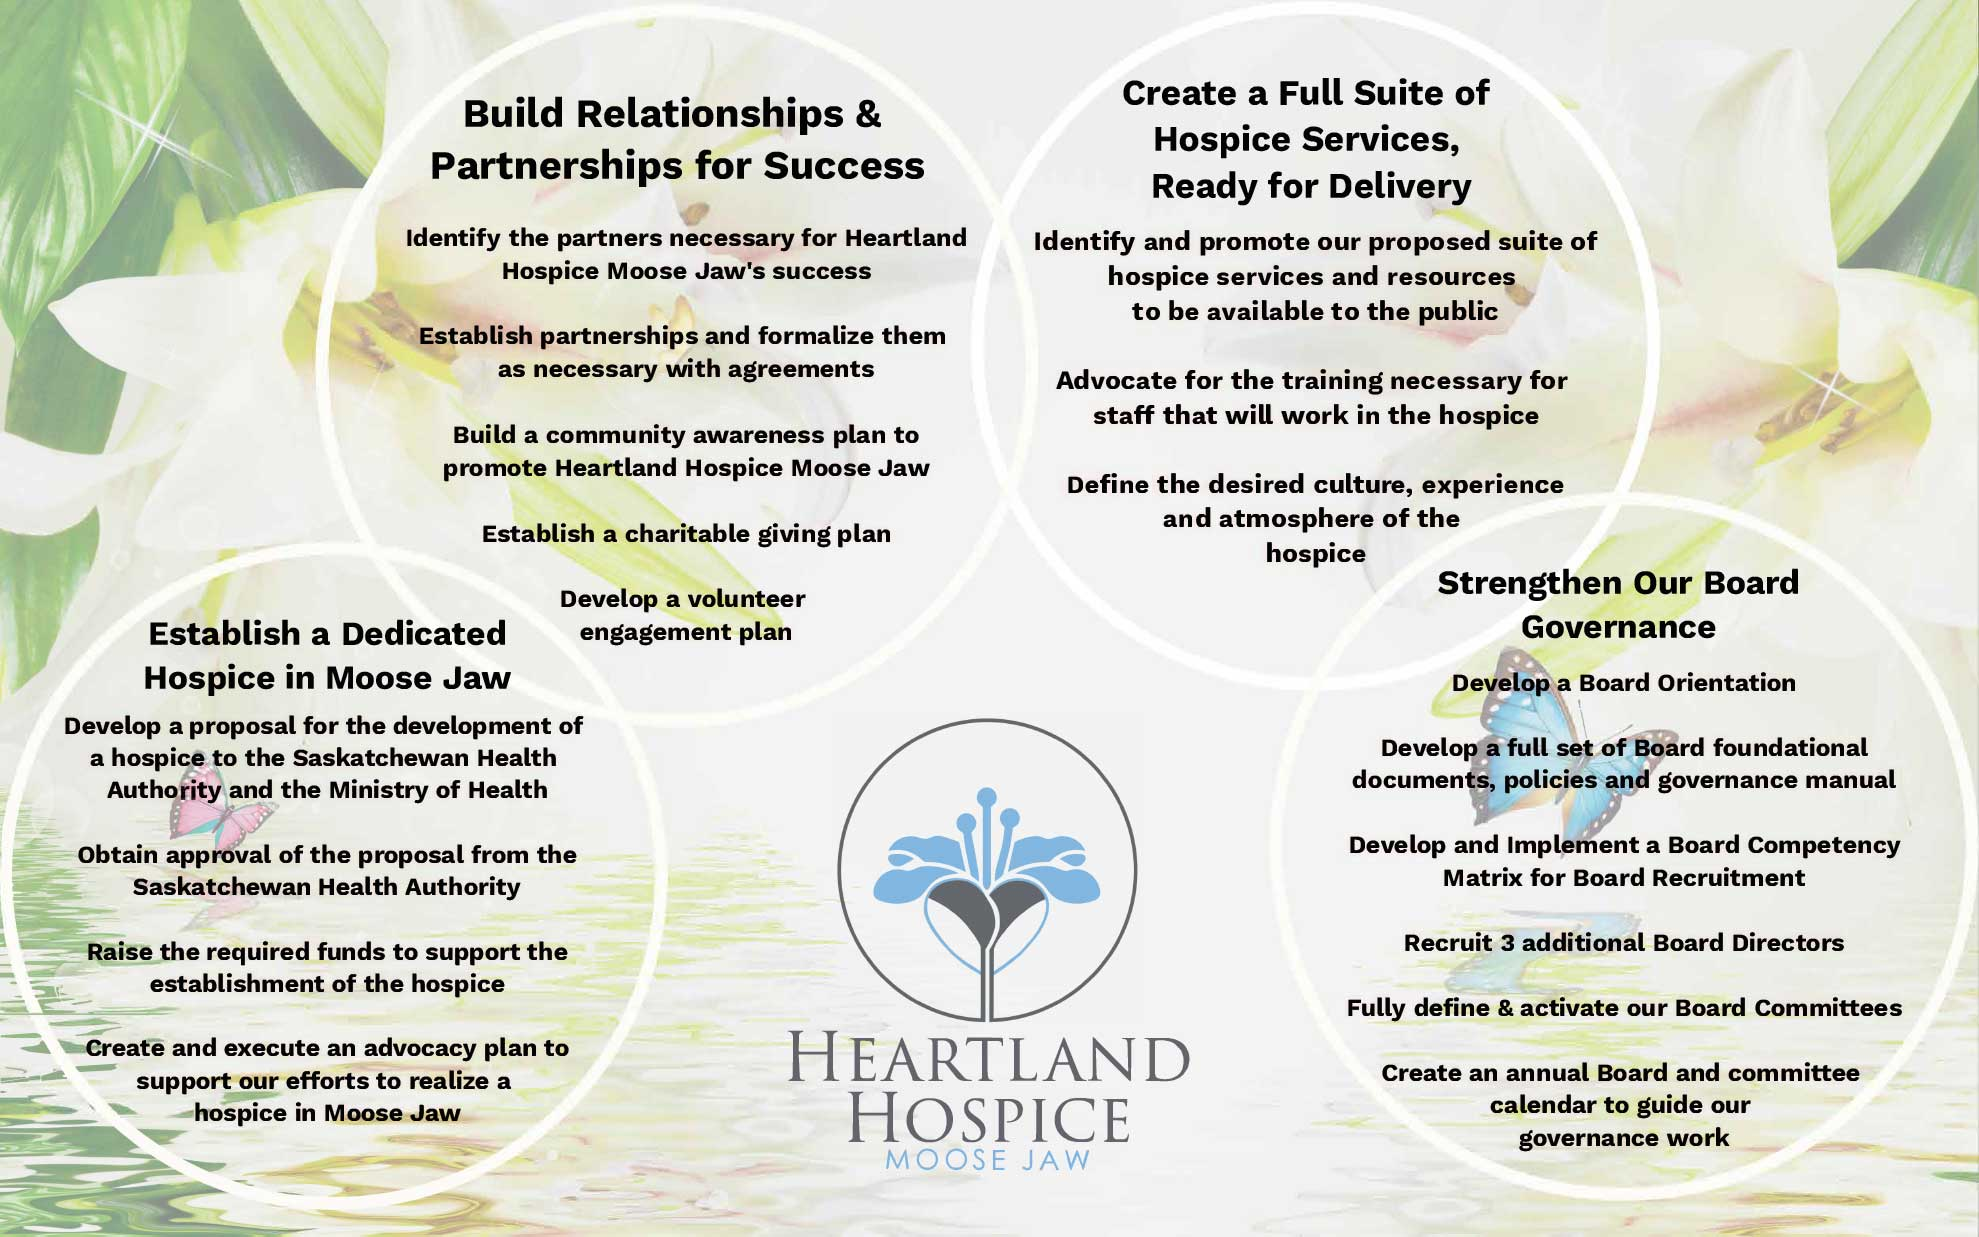 Heartland Hospice Moose Jaw Strategic Map